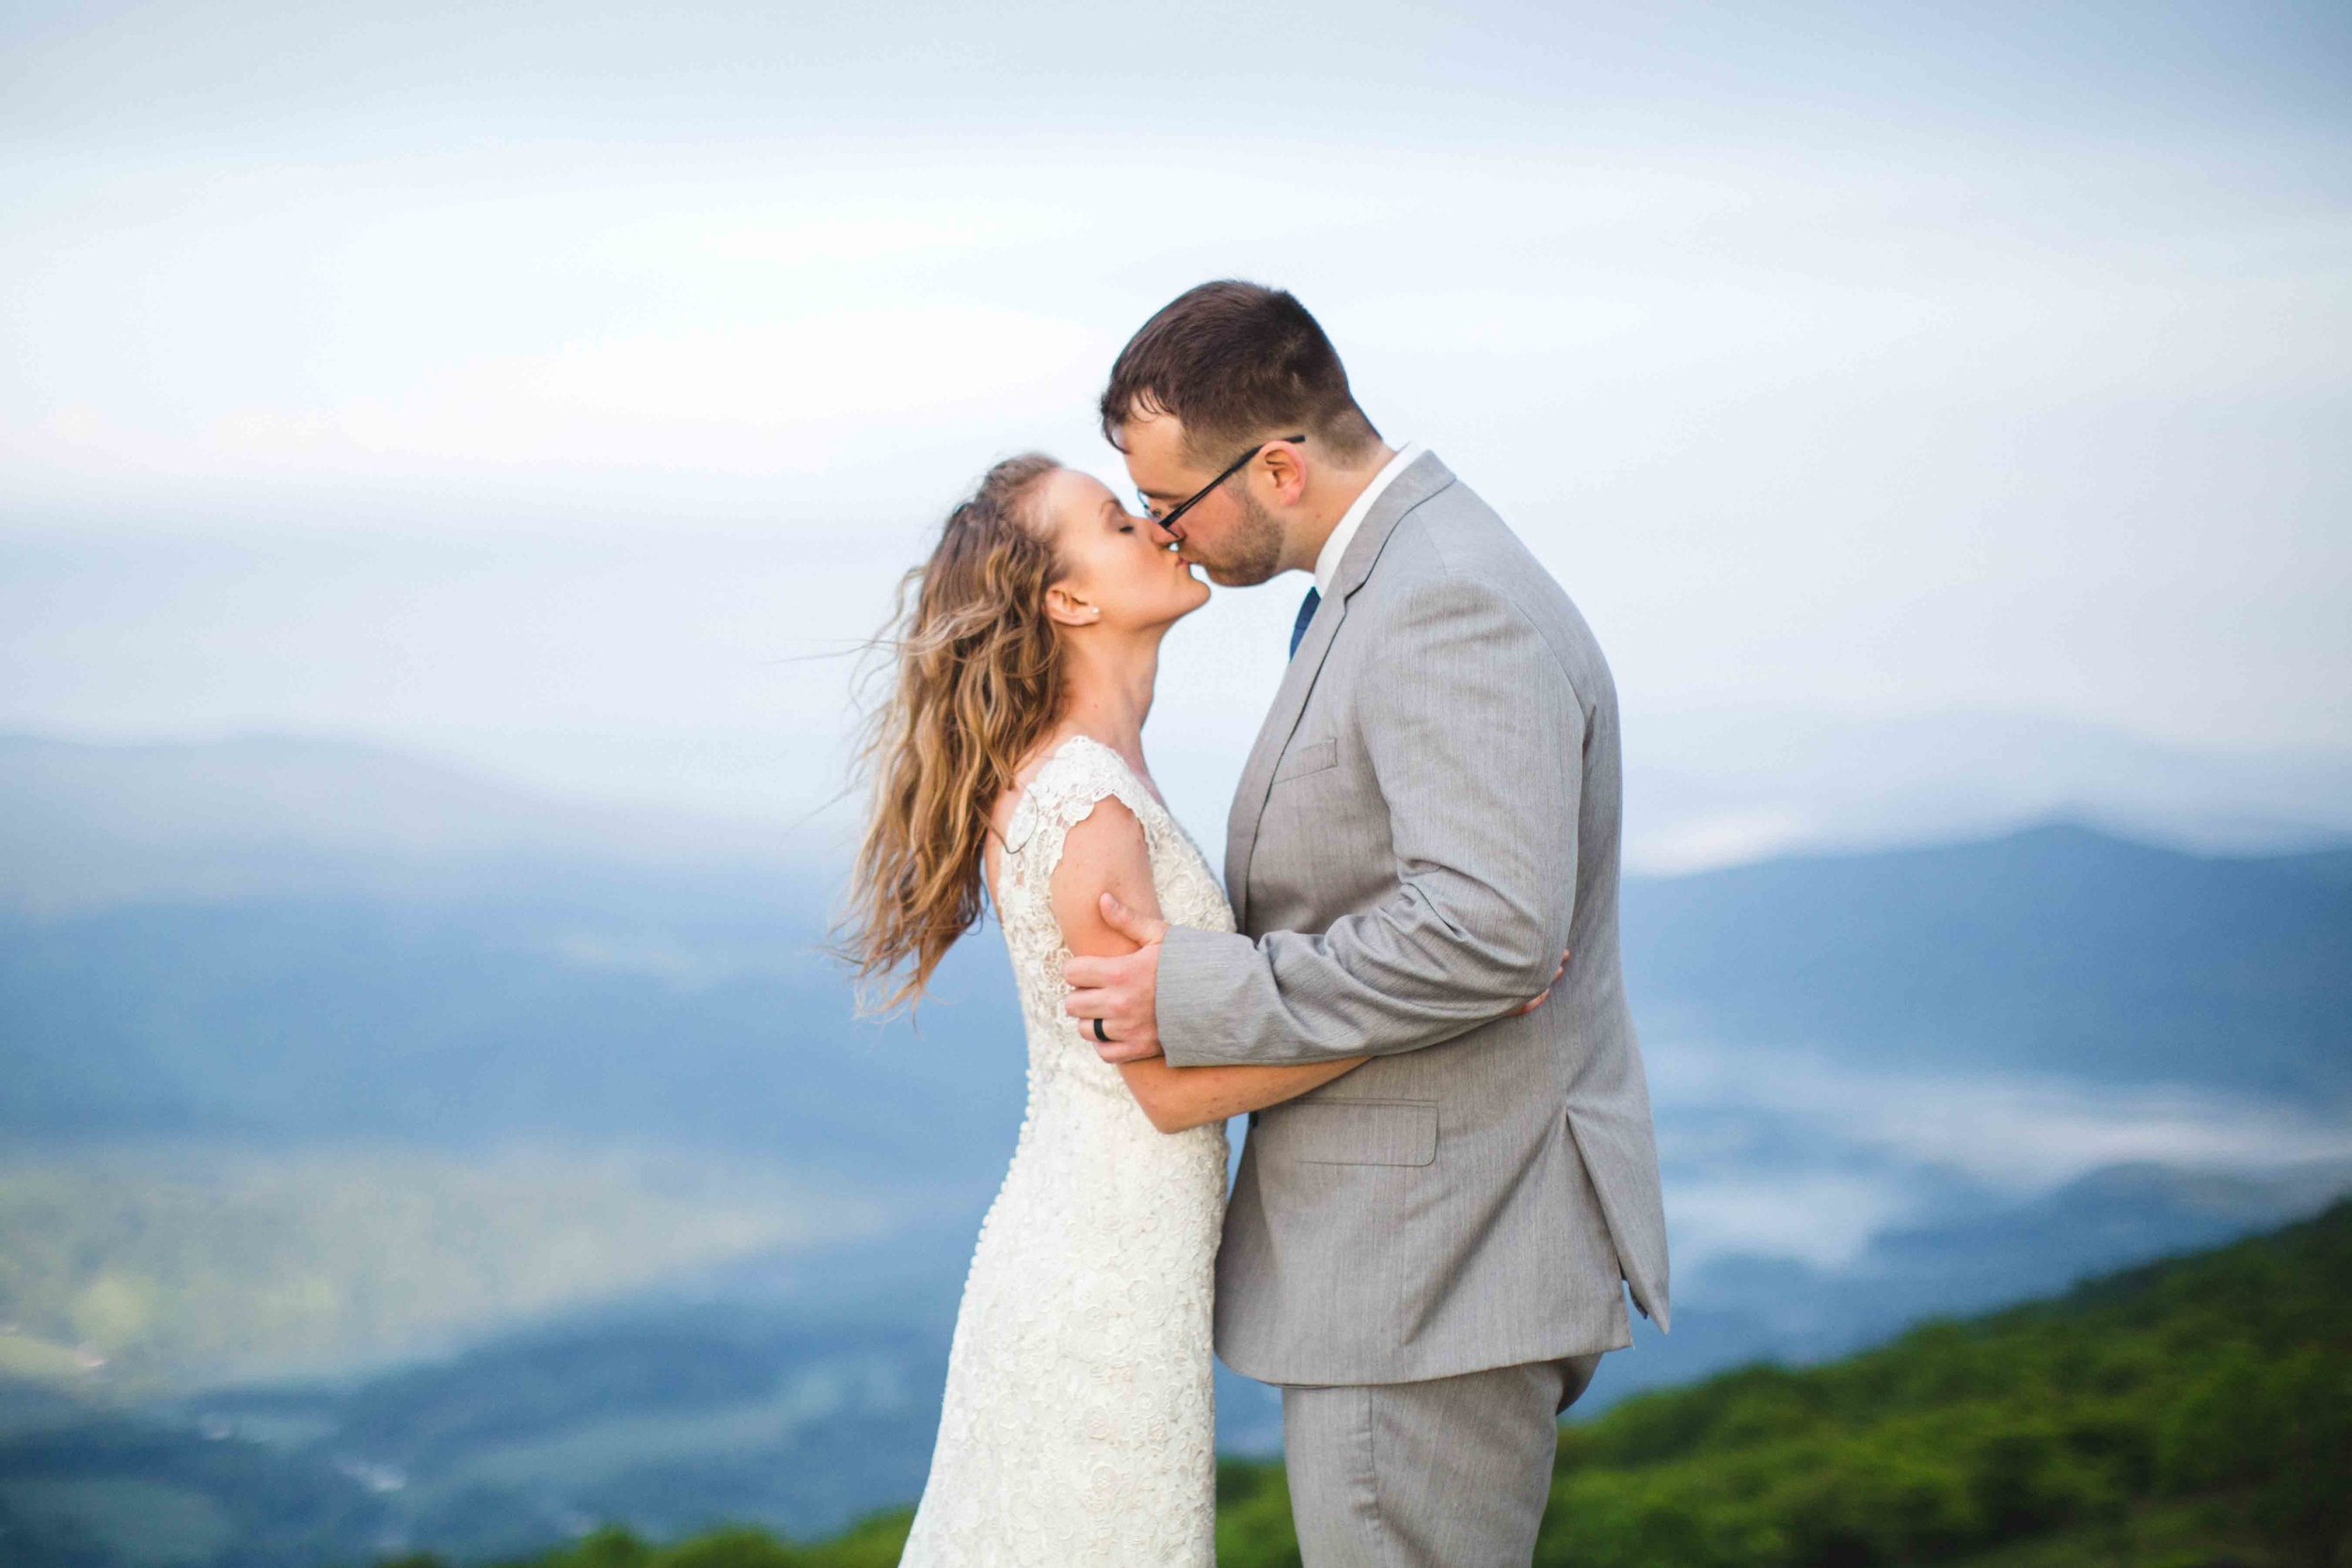 north-carolina-elopement-photographer-74.jpg